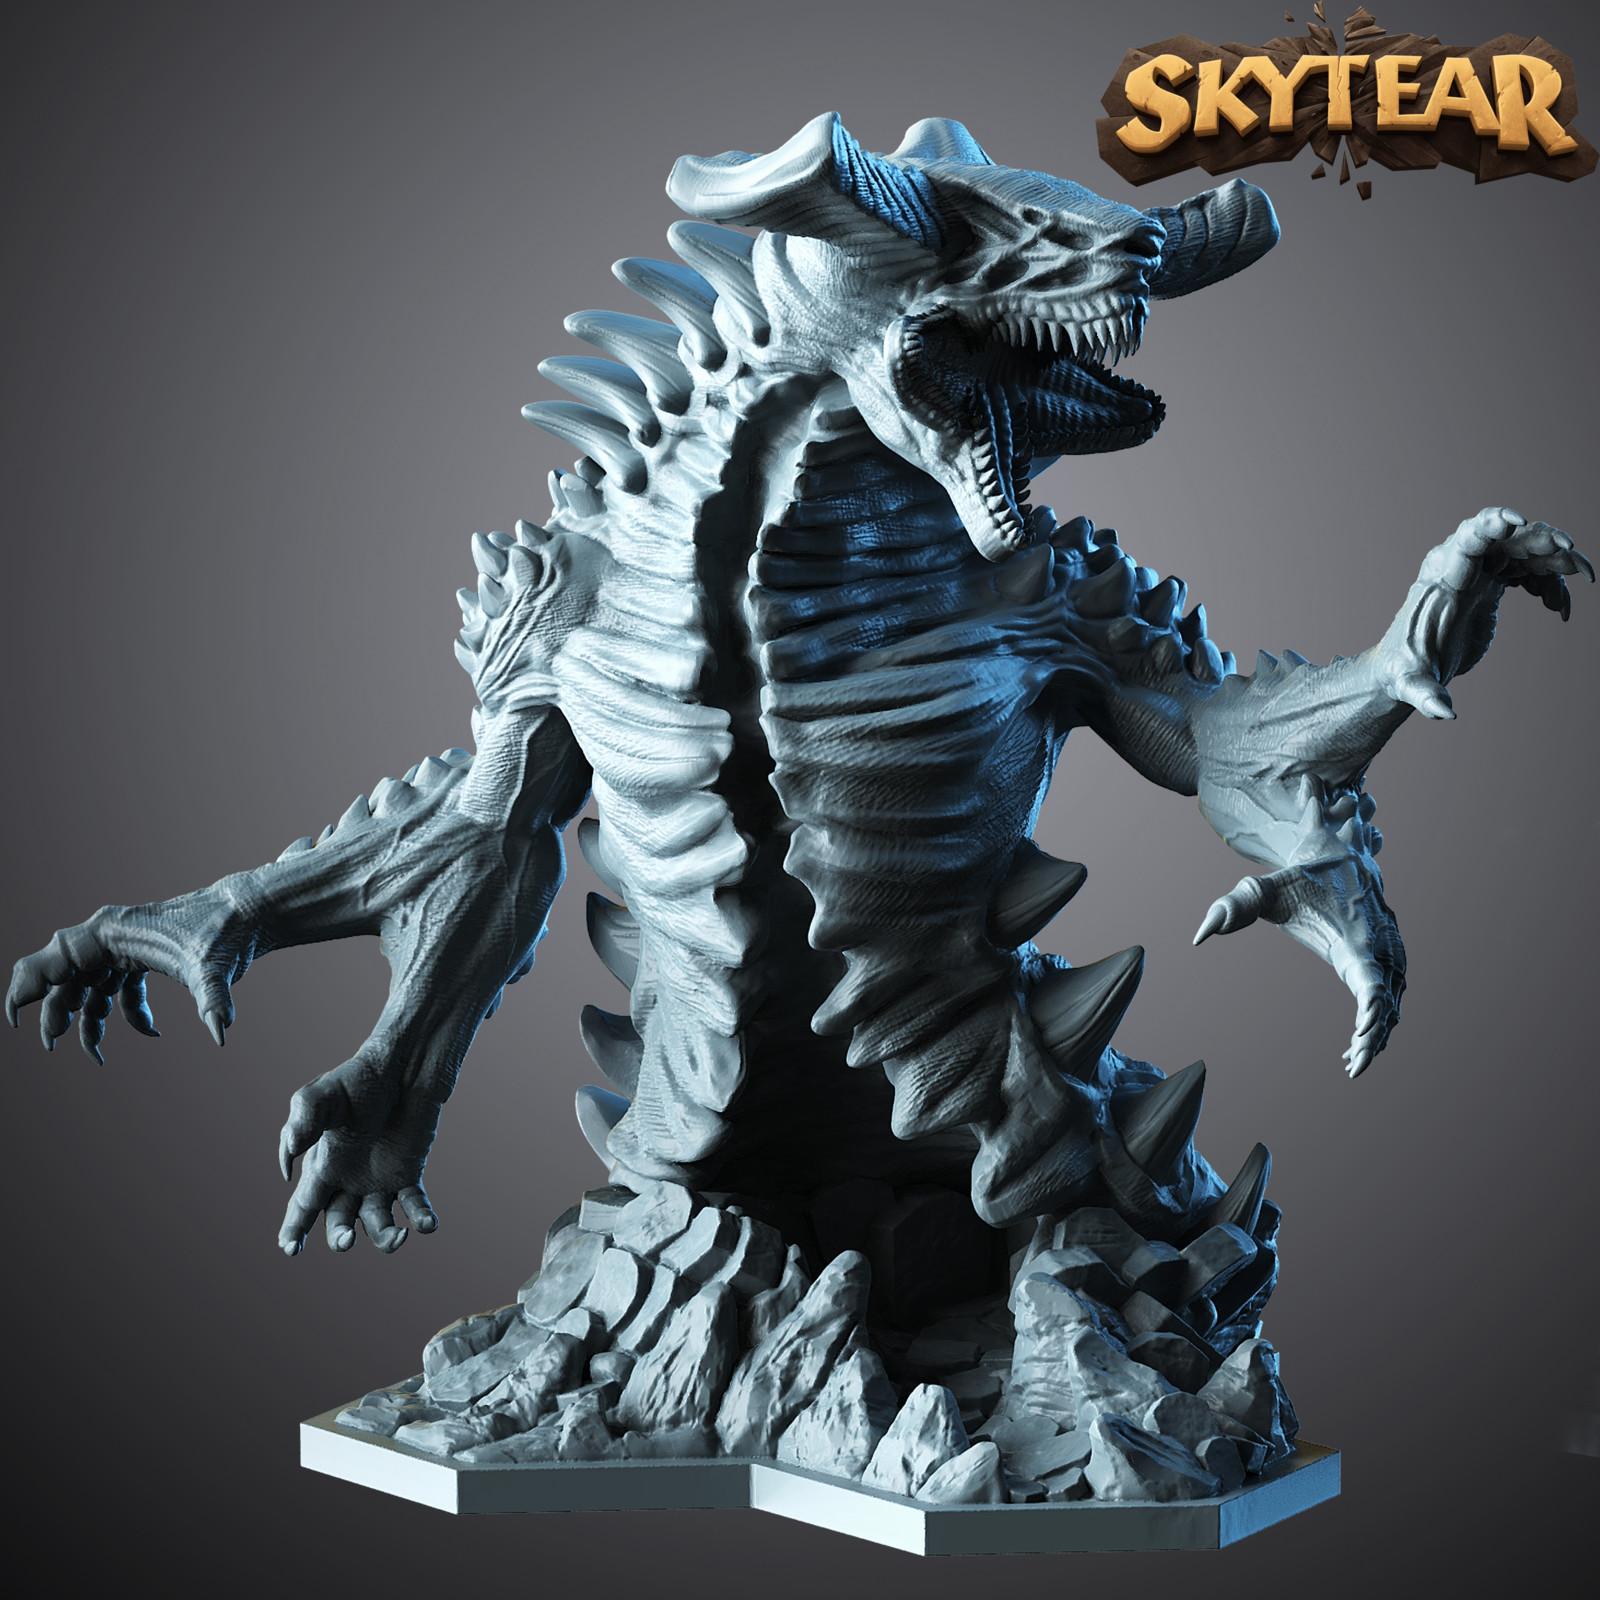 Skytear boardgame miniatures - Outsider